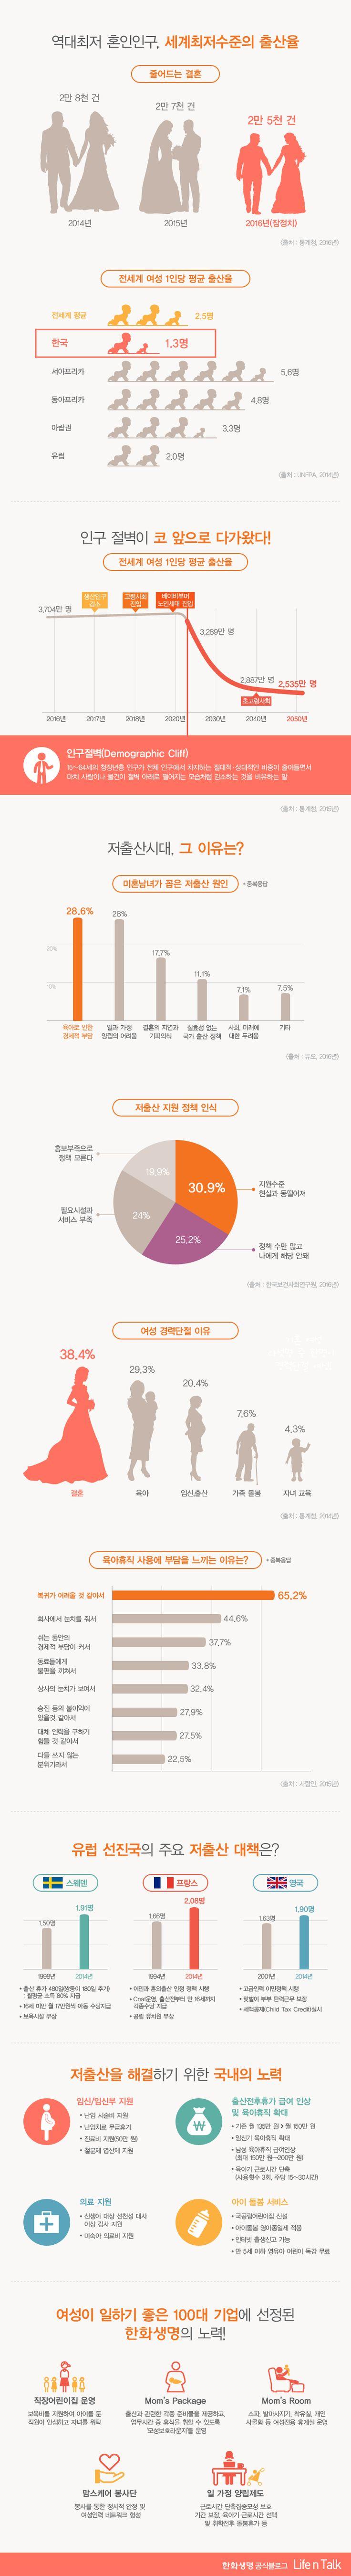 [Infographic]'유례없는 저출산 시대 원인과 해결책'에 관한 인포그래픽